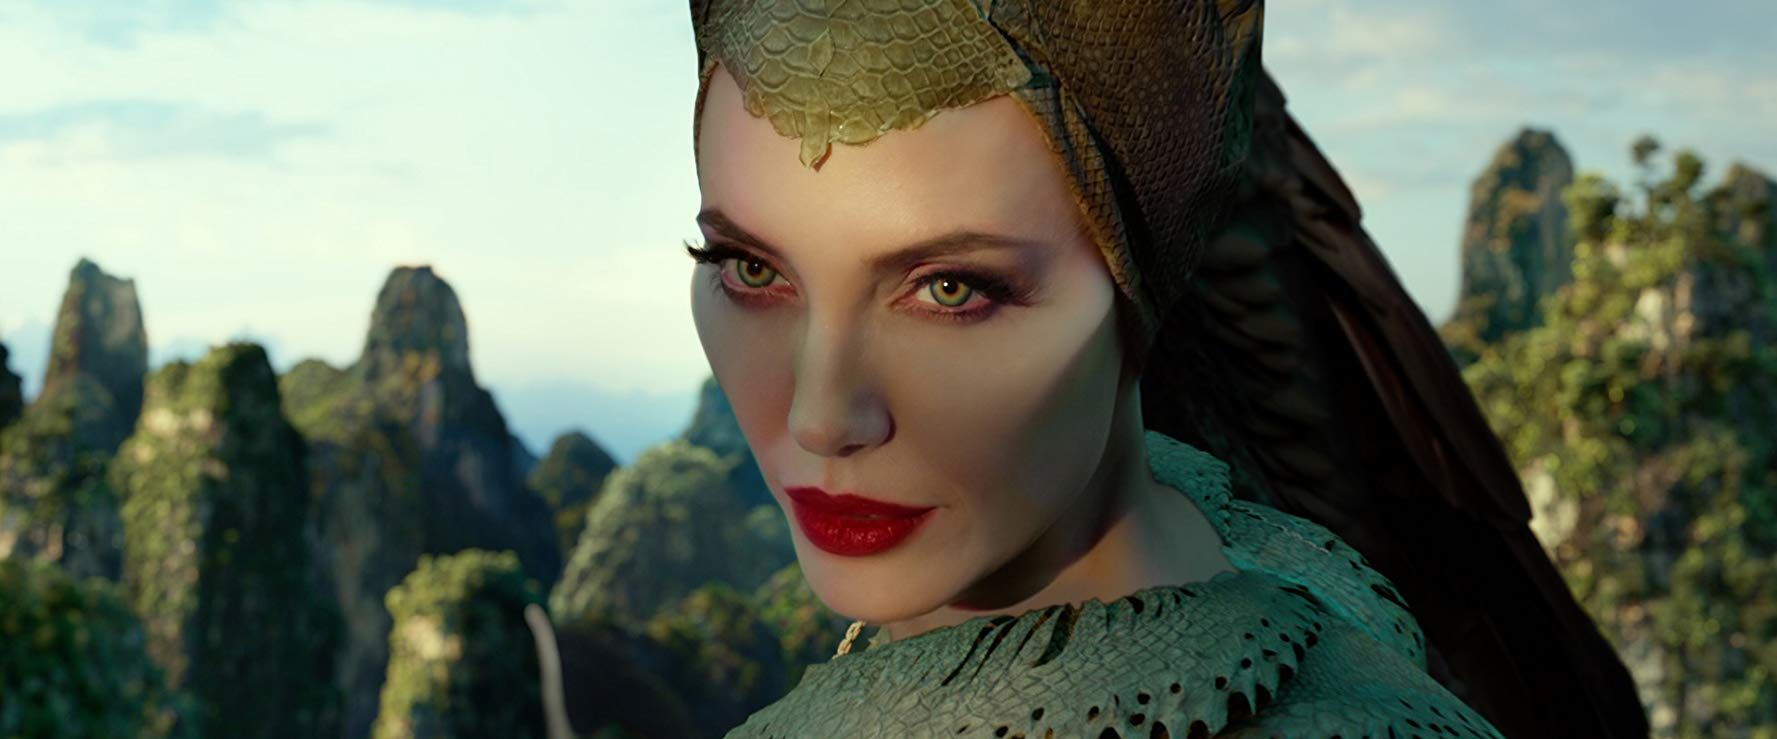 Hd Watch Maleficent Mistress Of Evil Online 2019 Full